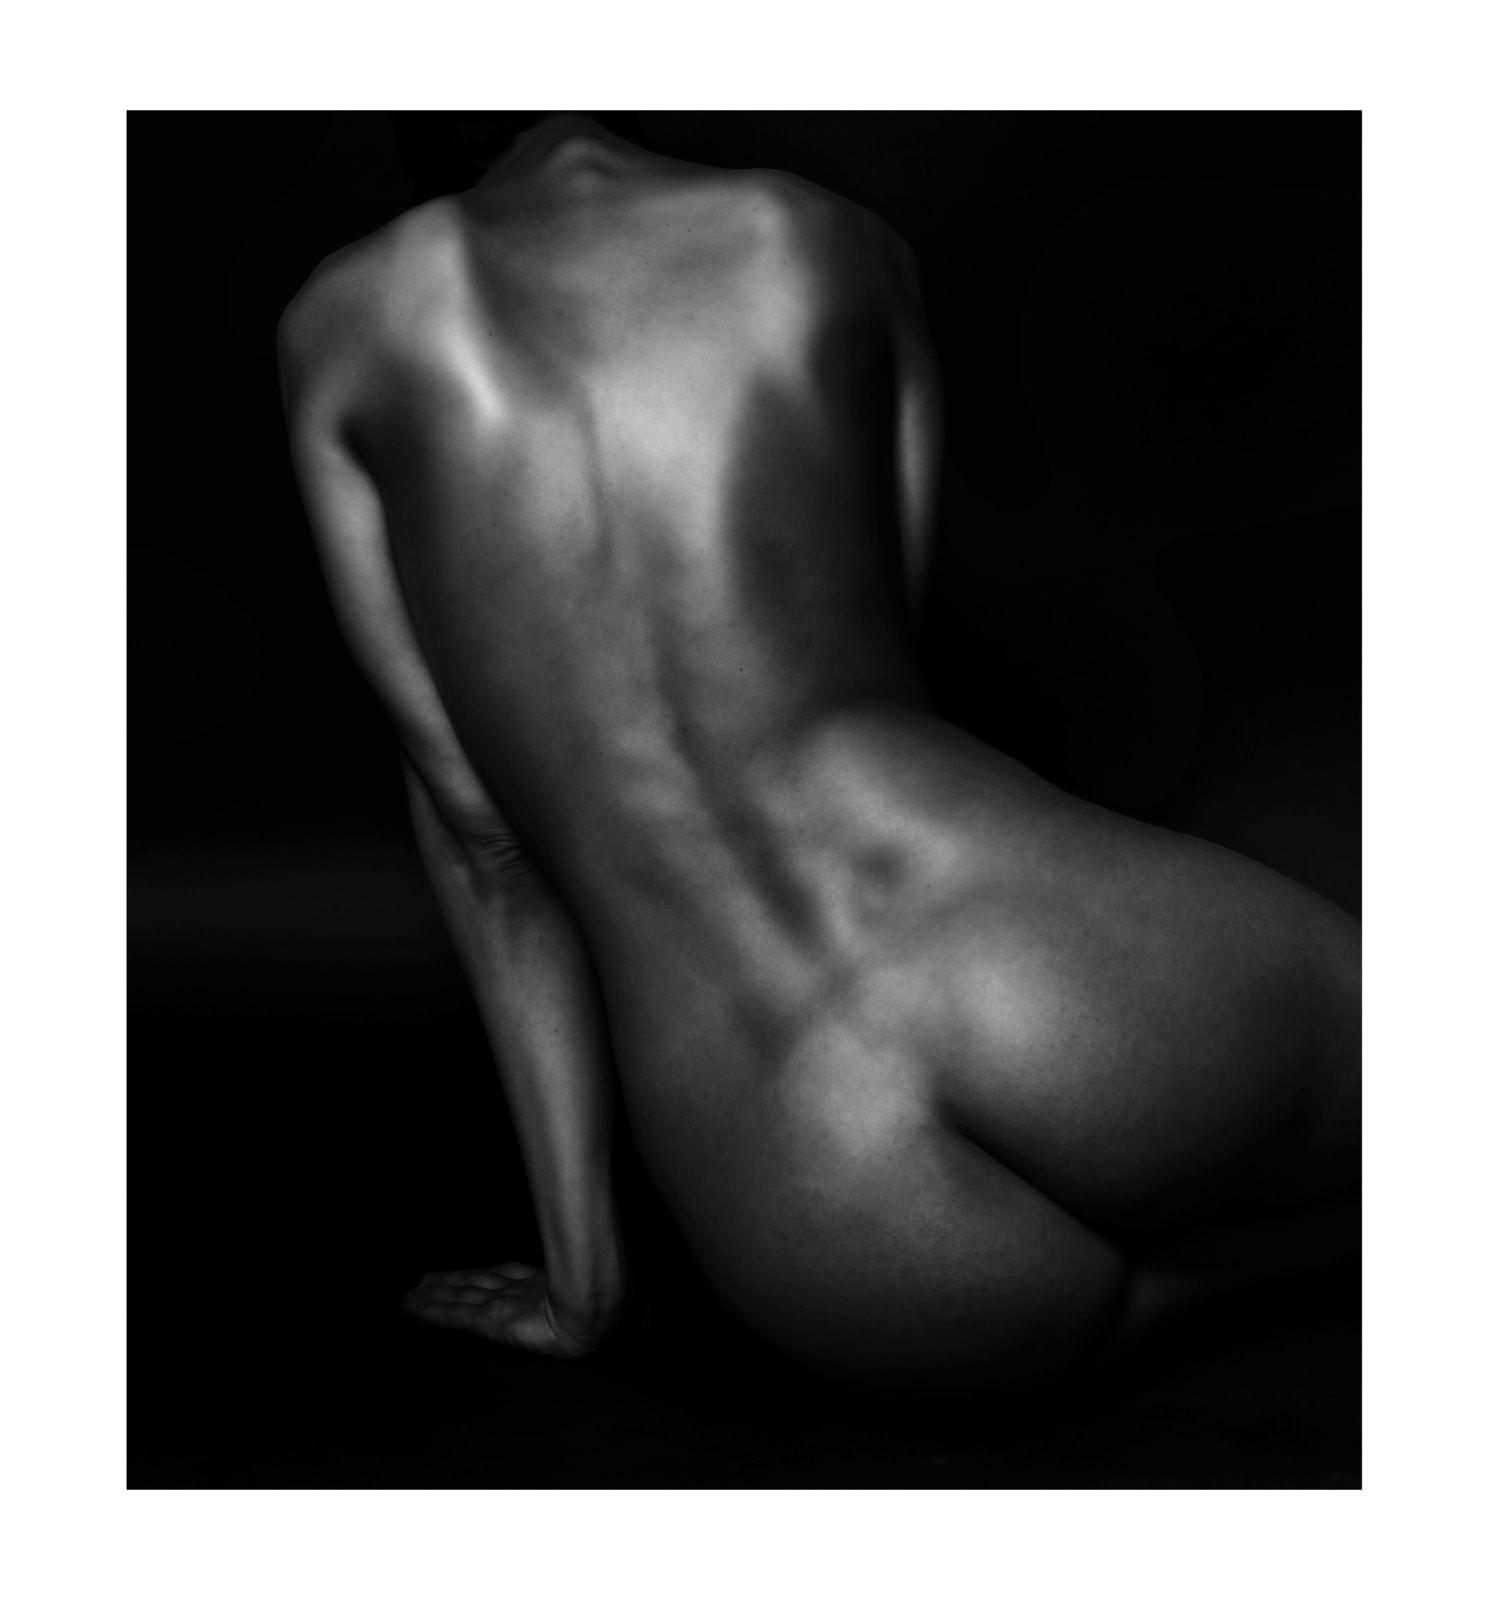 Almin Zrno, Body Sculpture #16, 2018